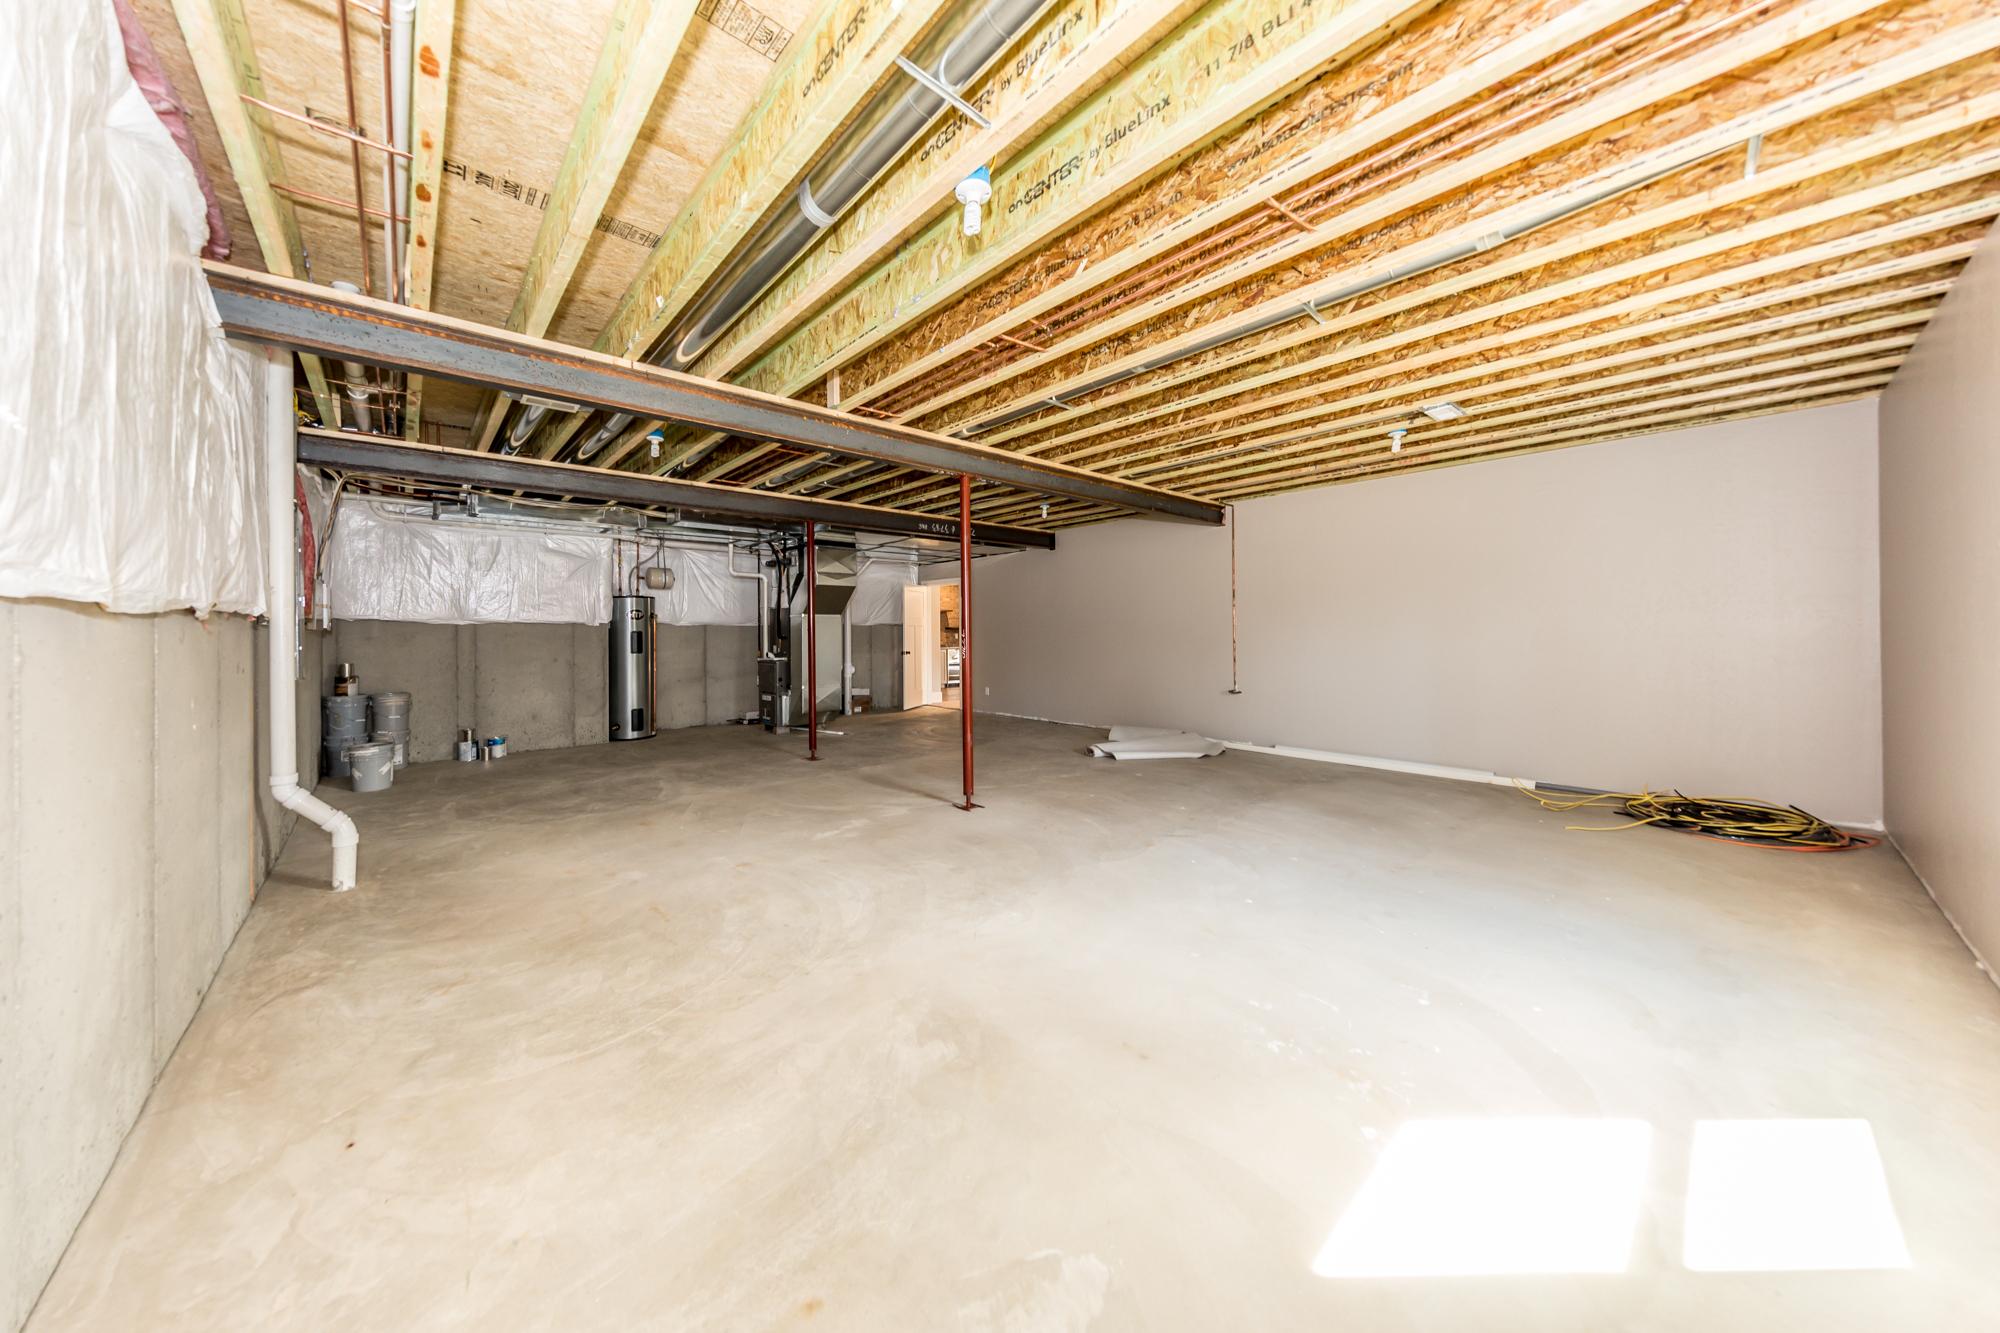 New-Construction-For-Sale-Bethel-Ridge-Farms-Scott-AFB-Illinois-40.jpg